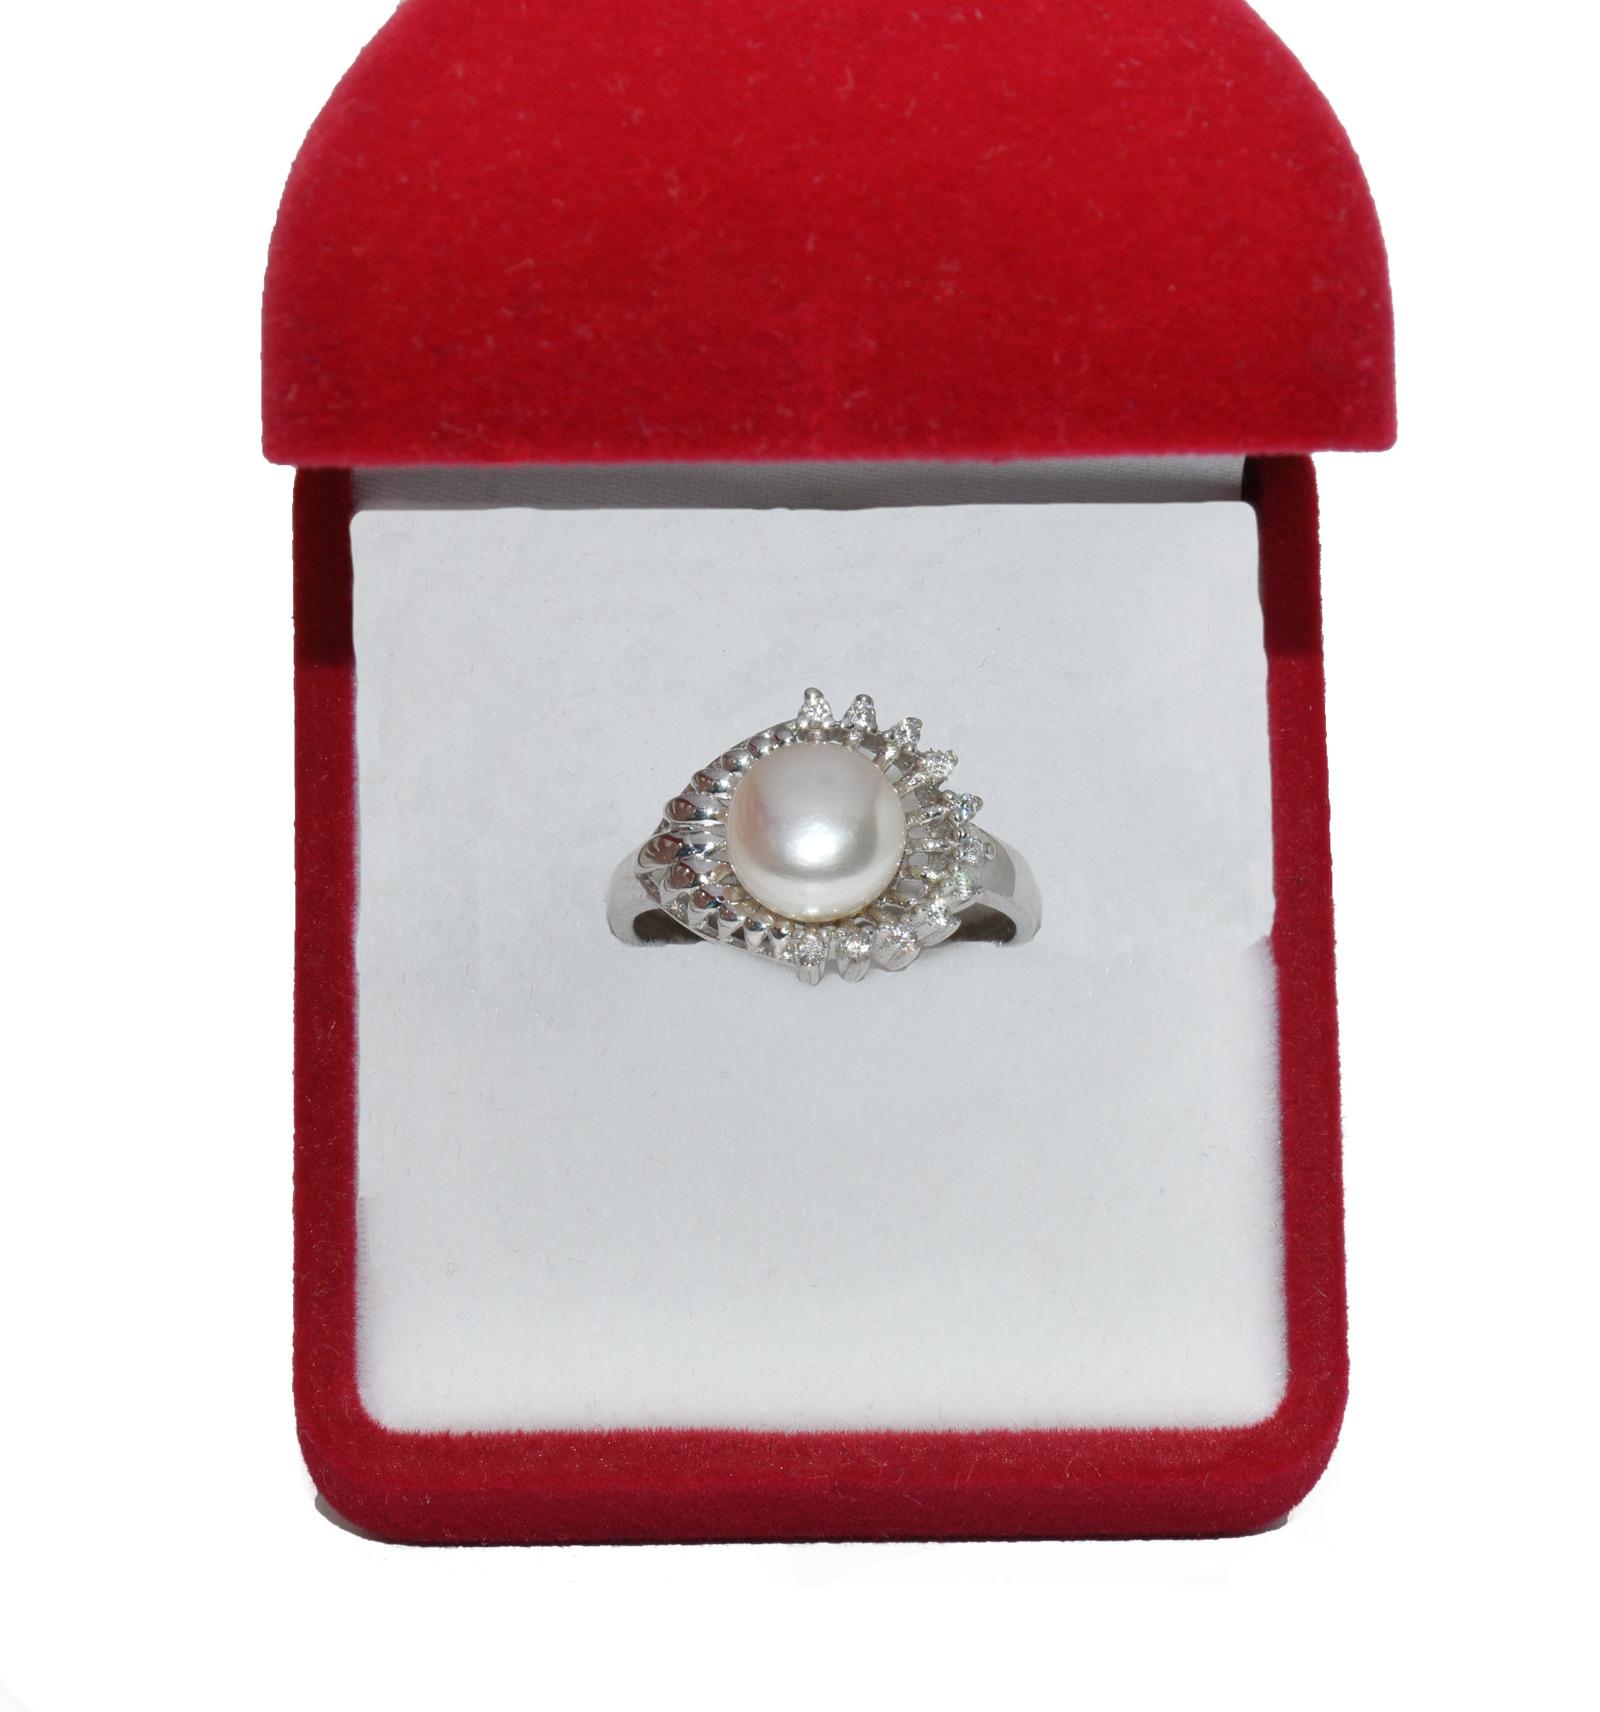 - Ahsen 925 Ayar Gümüş İncili Yüzük AH-0153 (1)